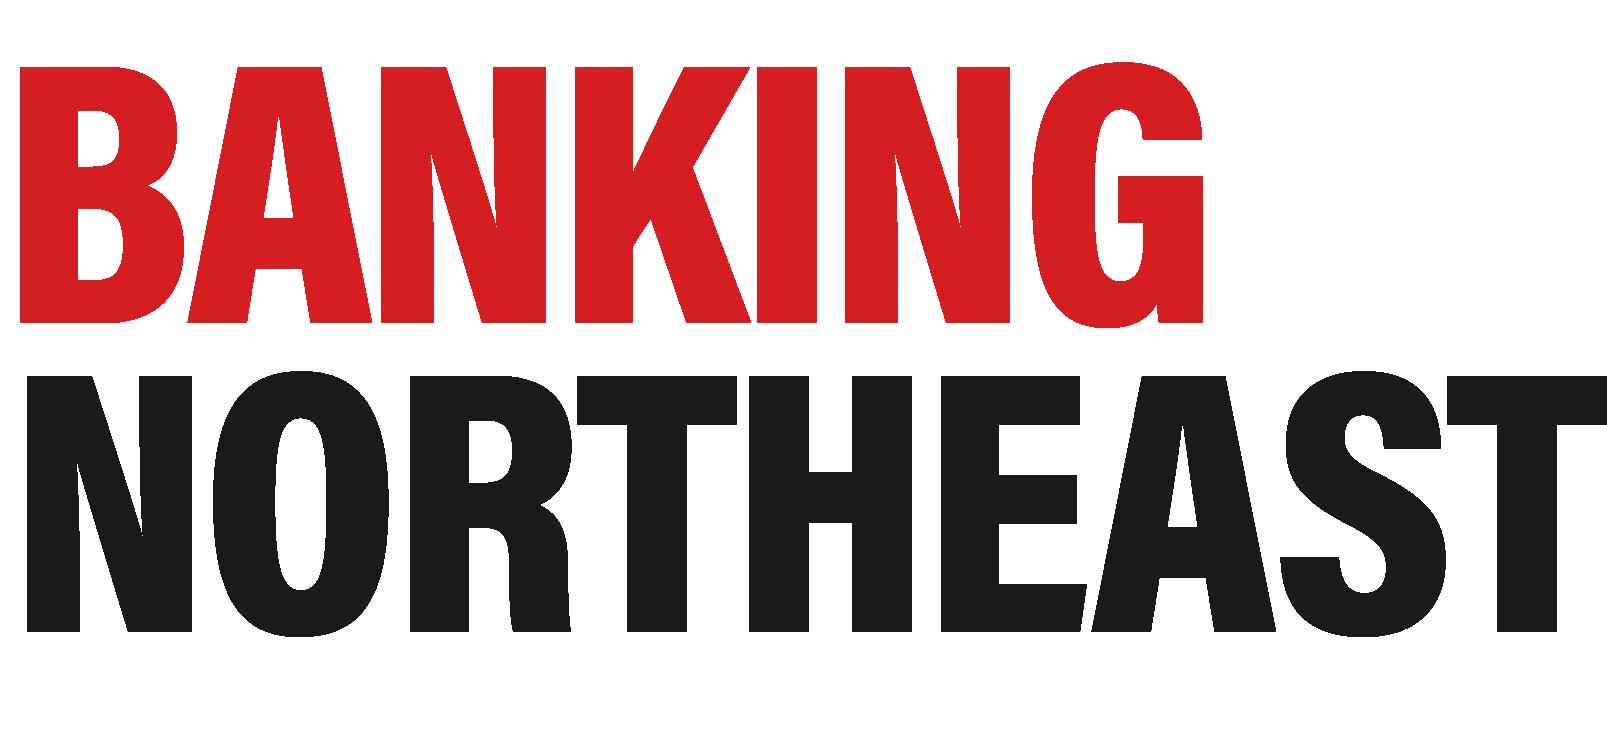 Banking Northeast